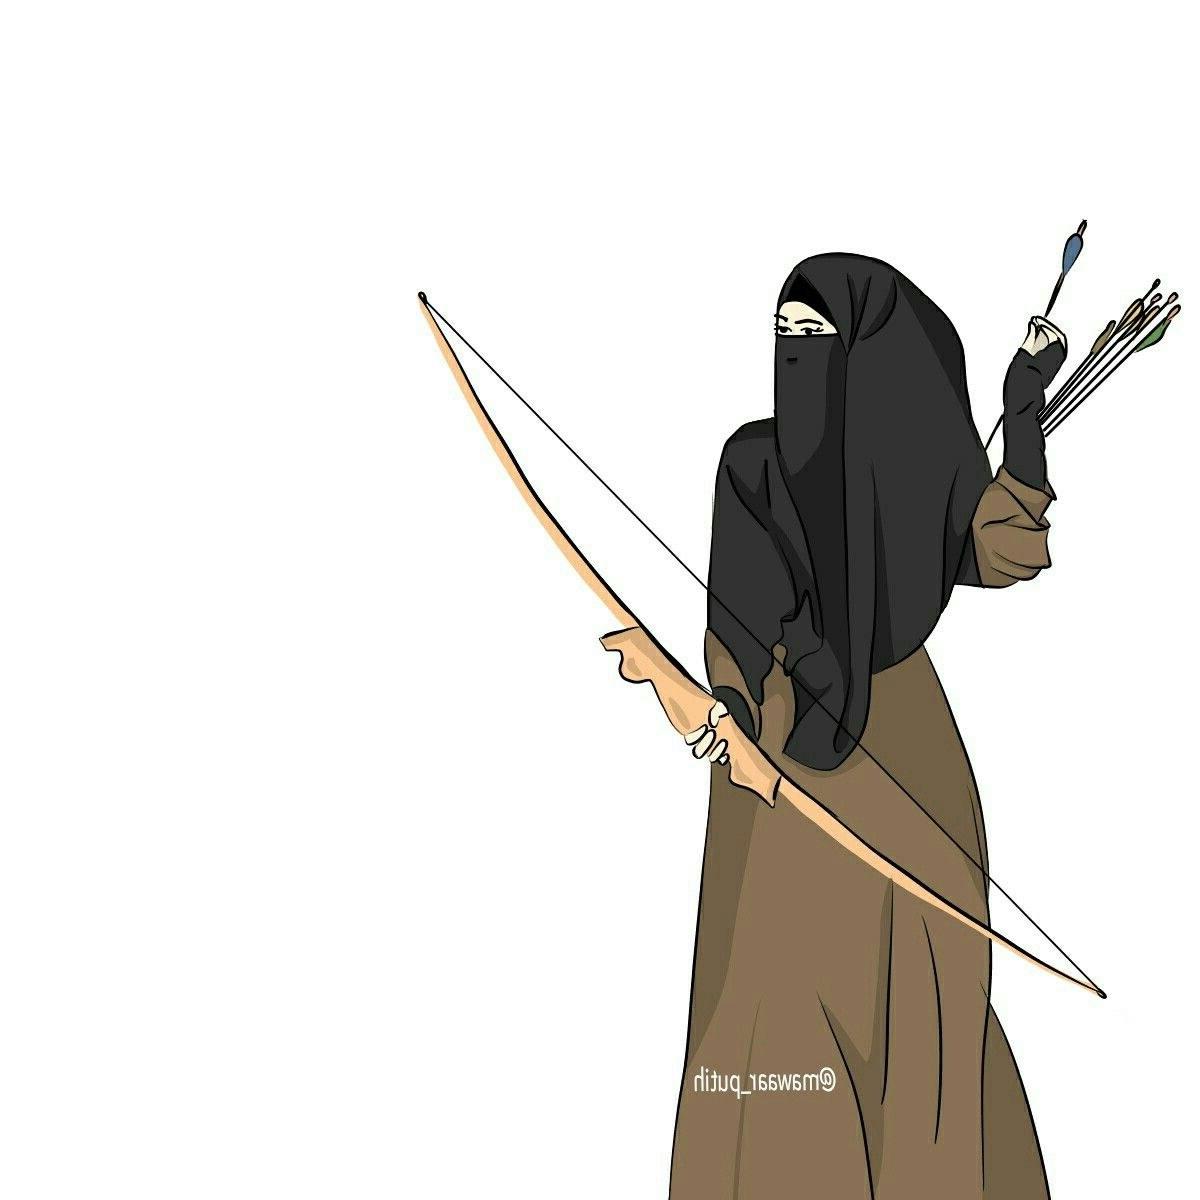 Design Muslimah Bercadar Memanah 9fdy Gambar Kartun Muslimah Memanah Koleksi Gambar Hd